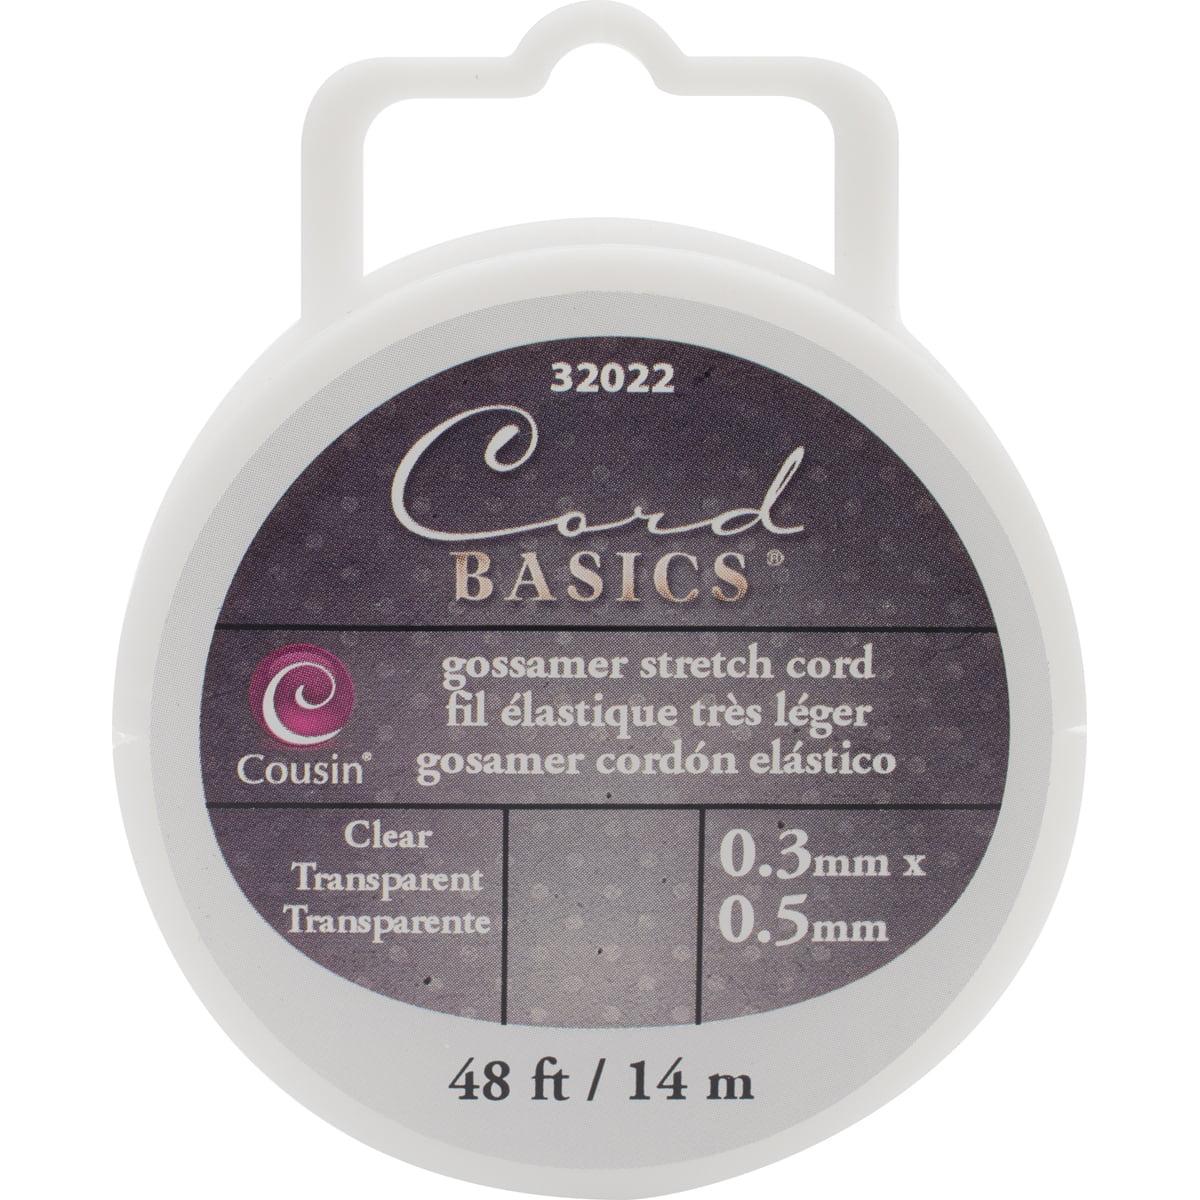 Cord Basics Gossamer Stretch Cord .5mmX48'-Clear